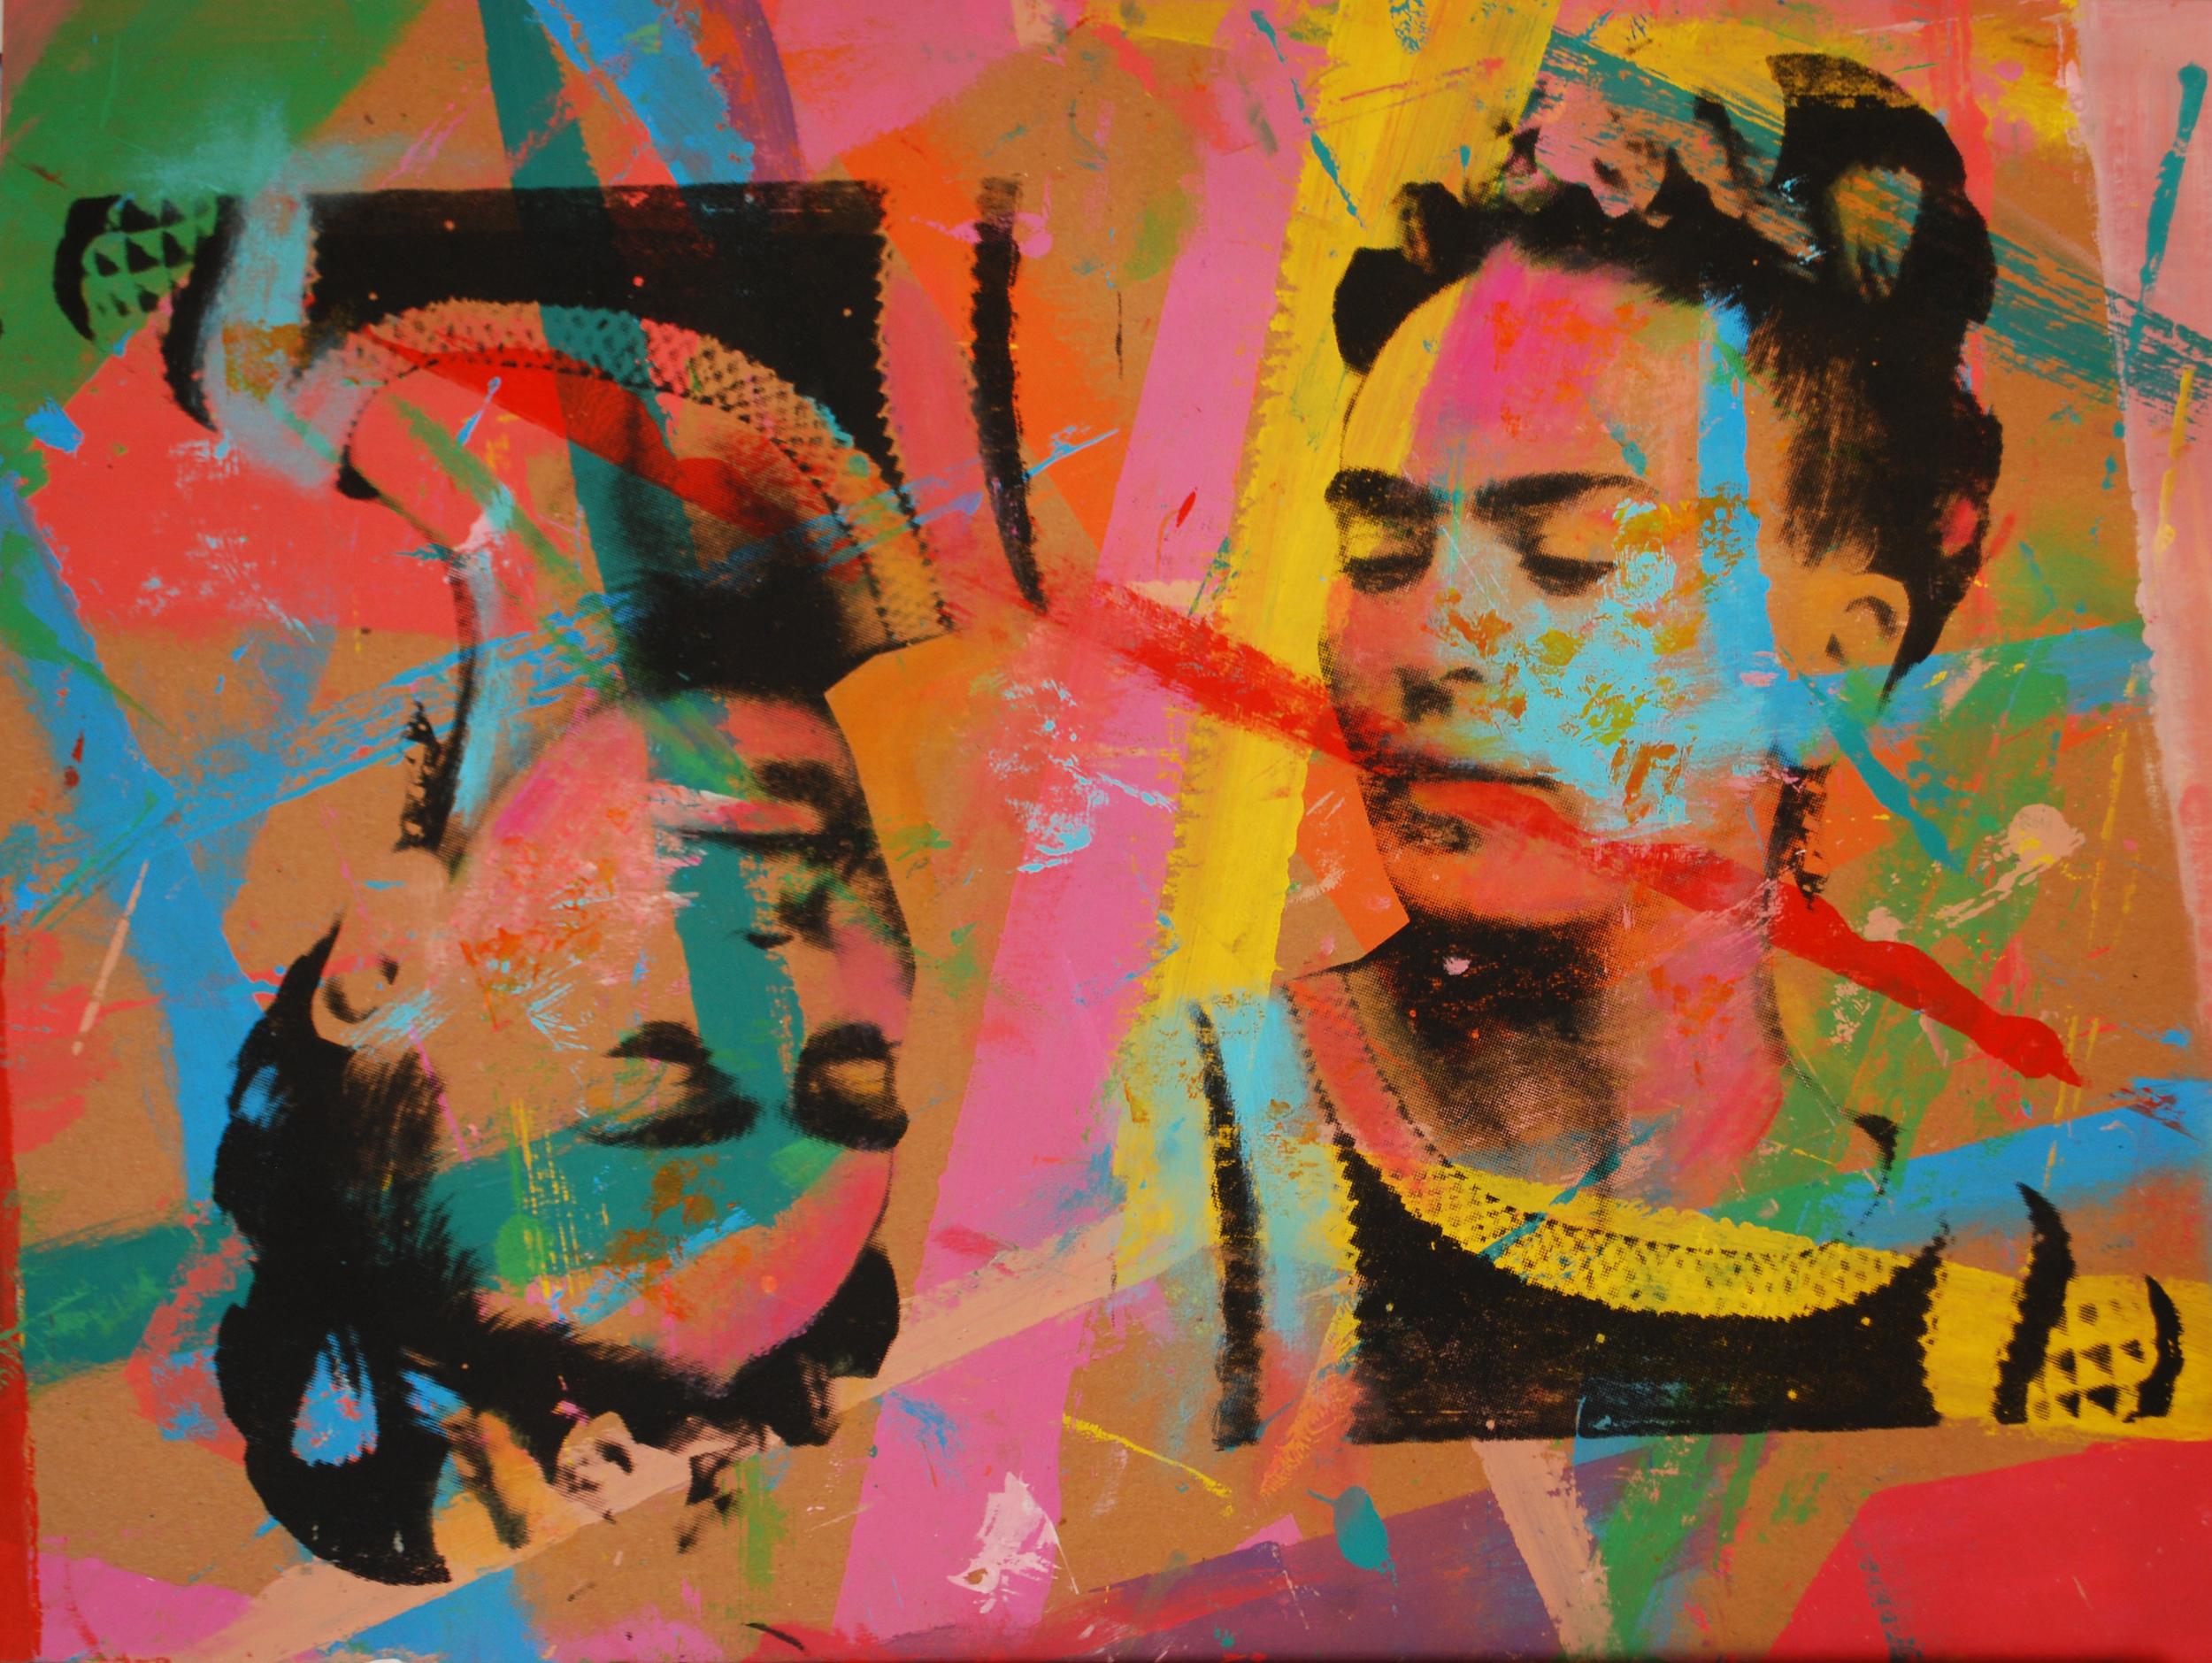 Frida 1. Over Carton 18 x 24 in